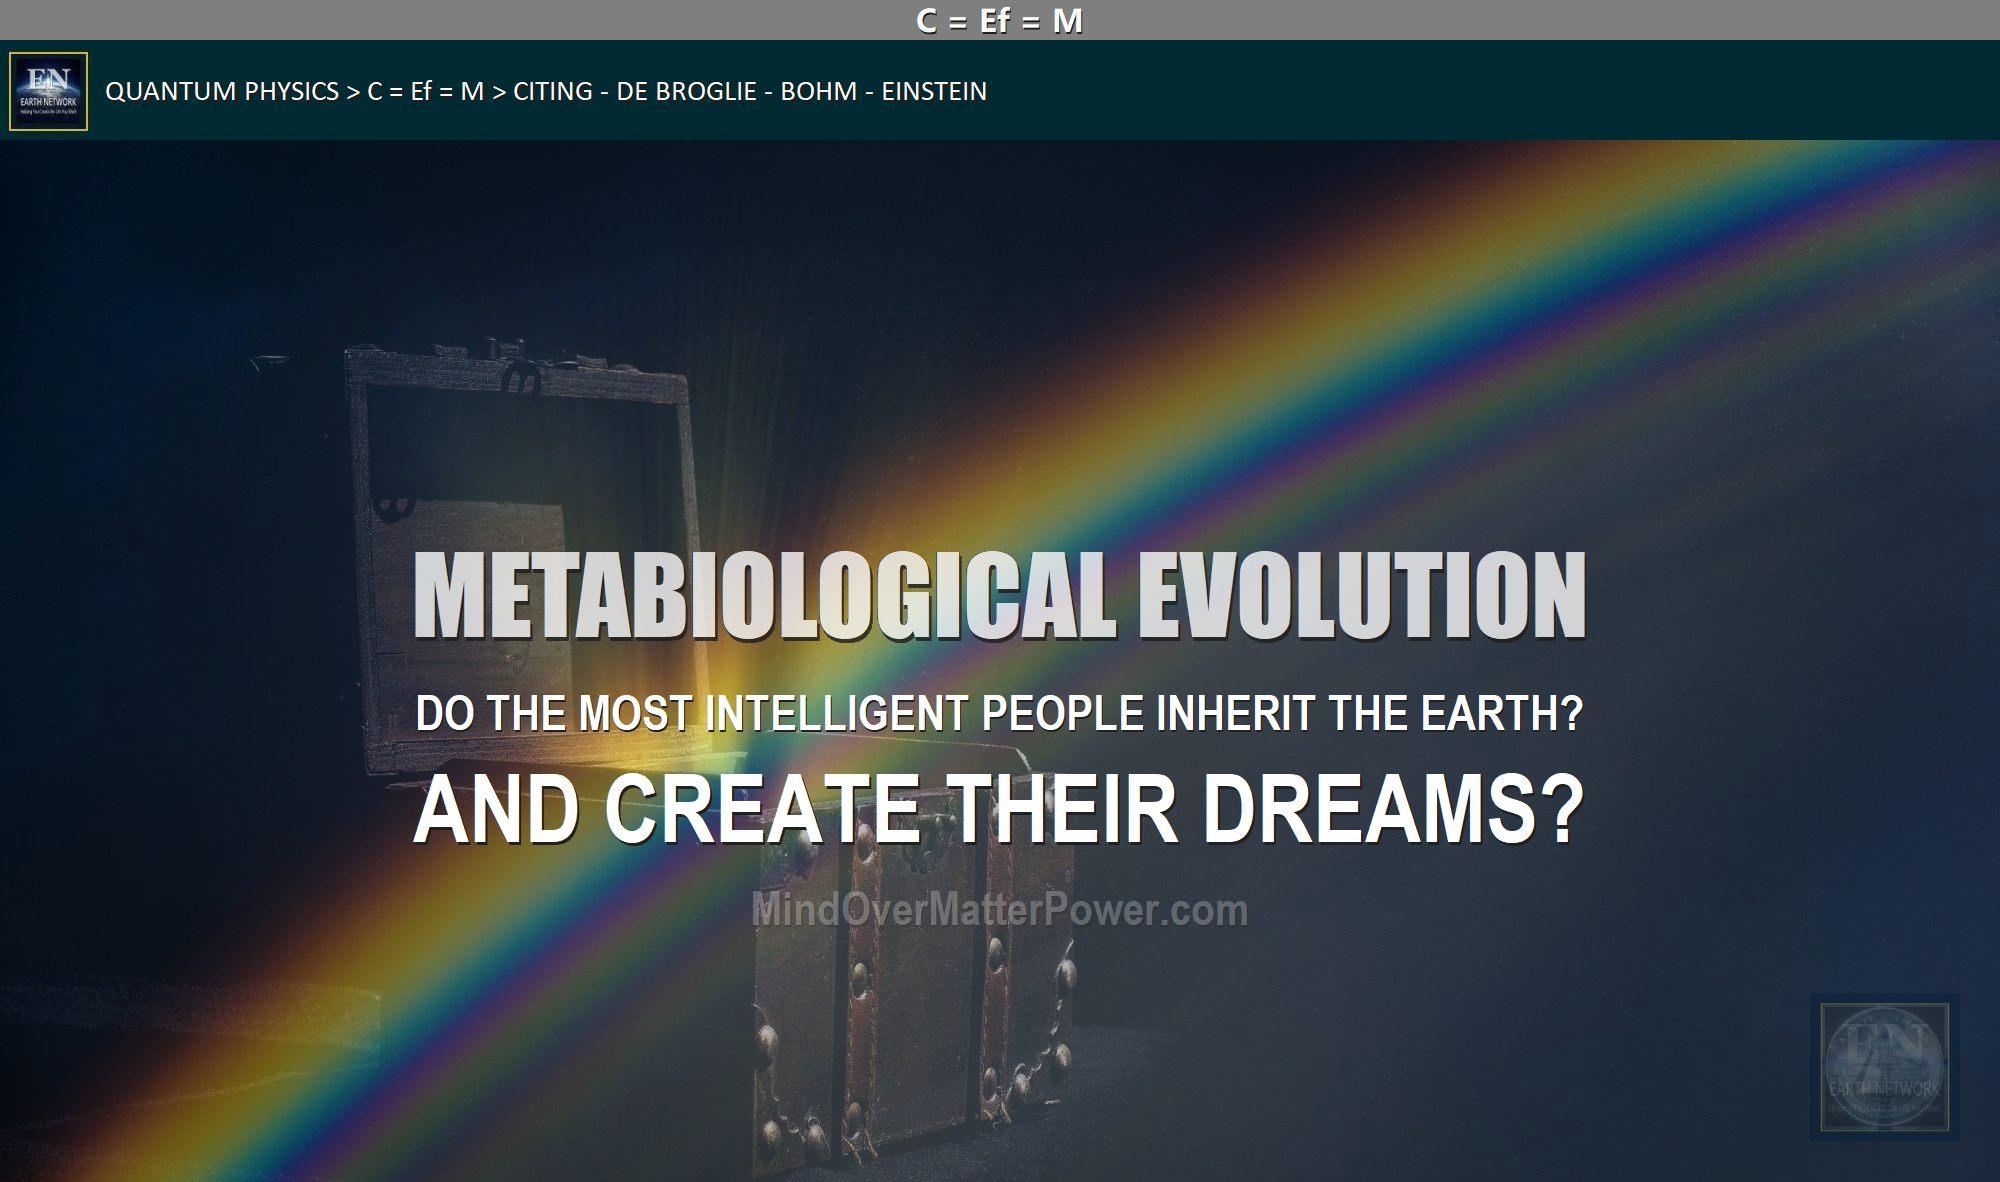 Treasure-depicts-the-Spiritual-New-Age-of-Aquarius-metabiological-evolution-advanced-human